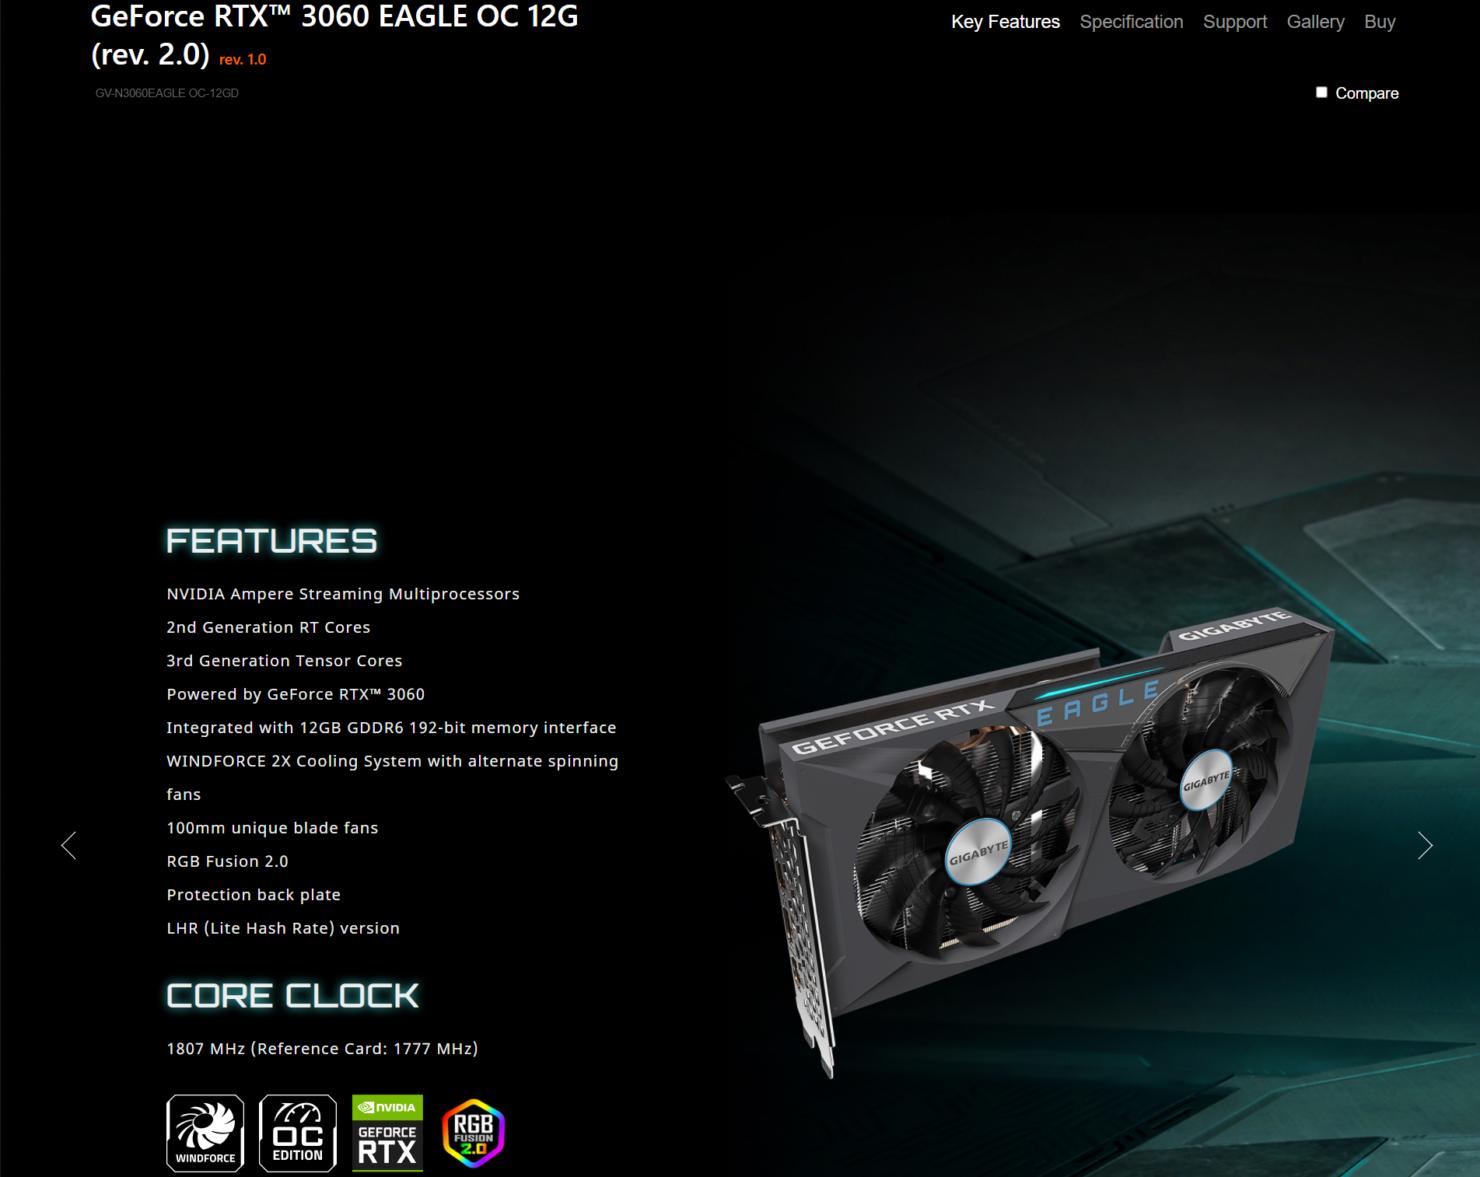 gigabyte-geforce-rtx-3060-eagle-oc-lhr